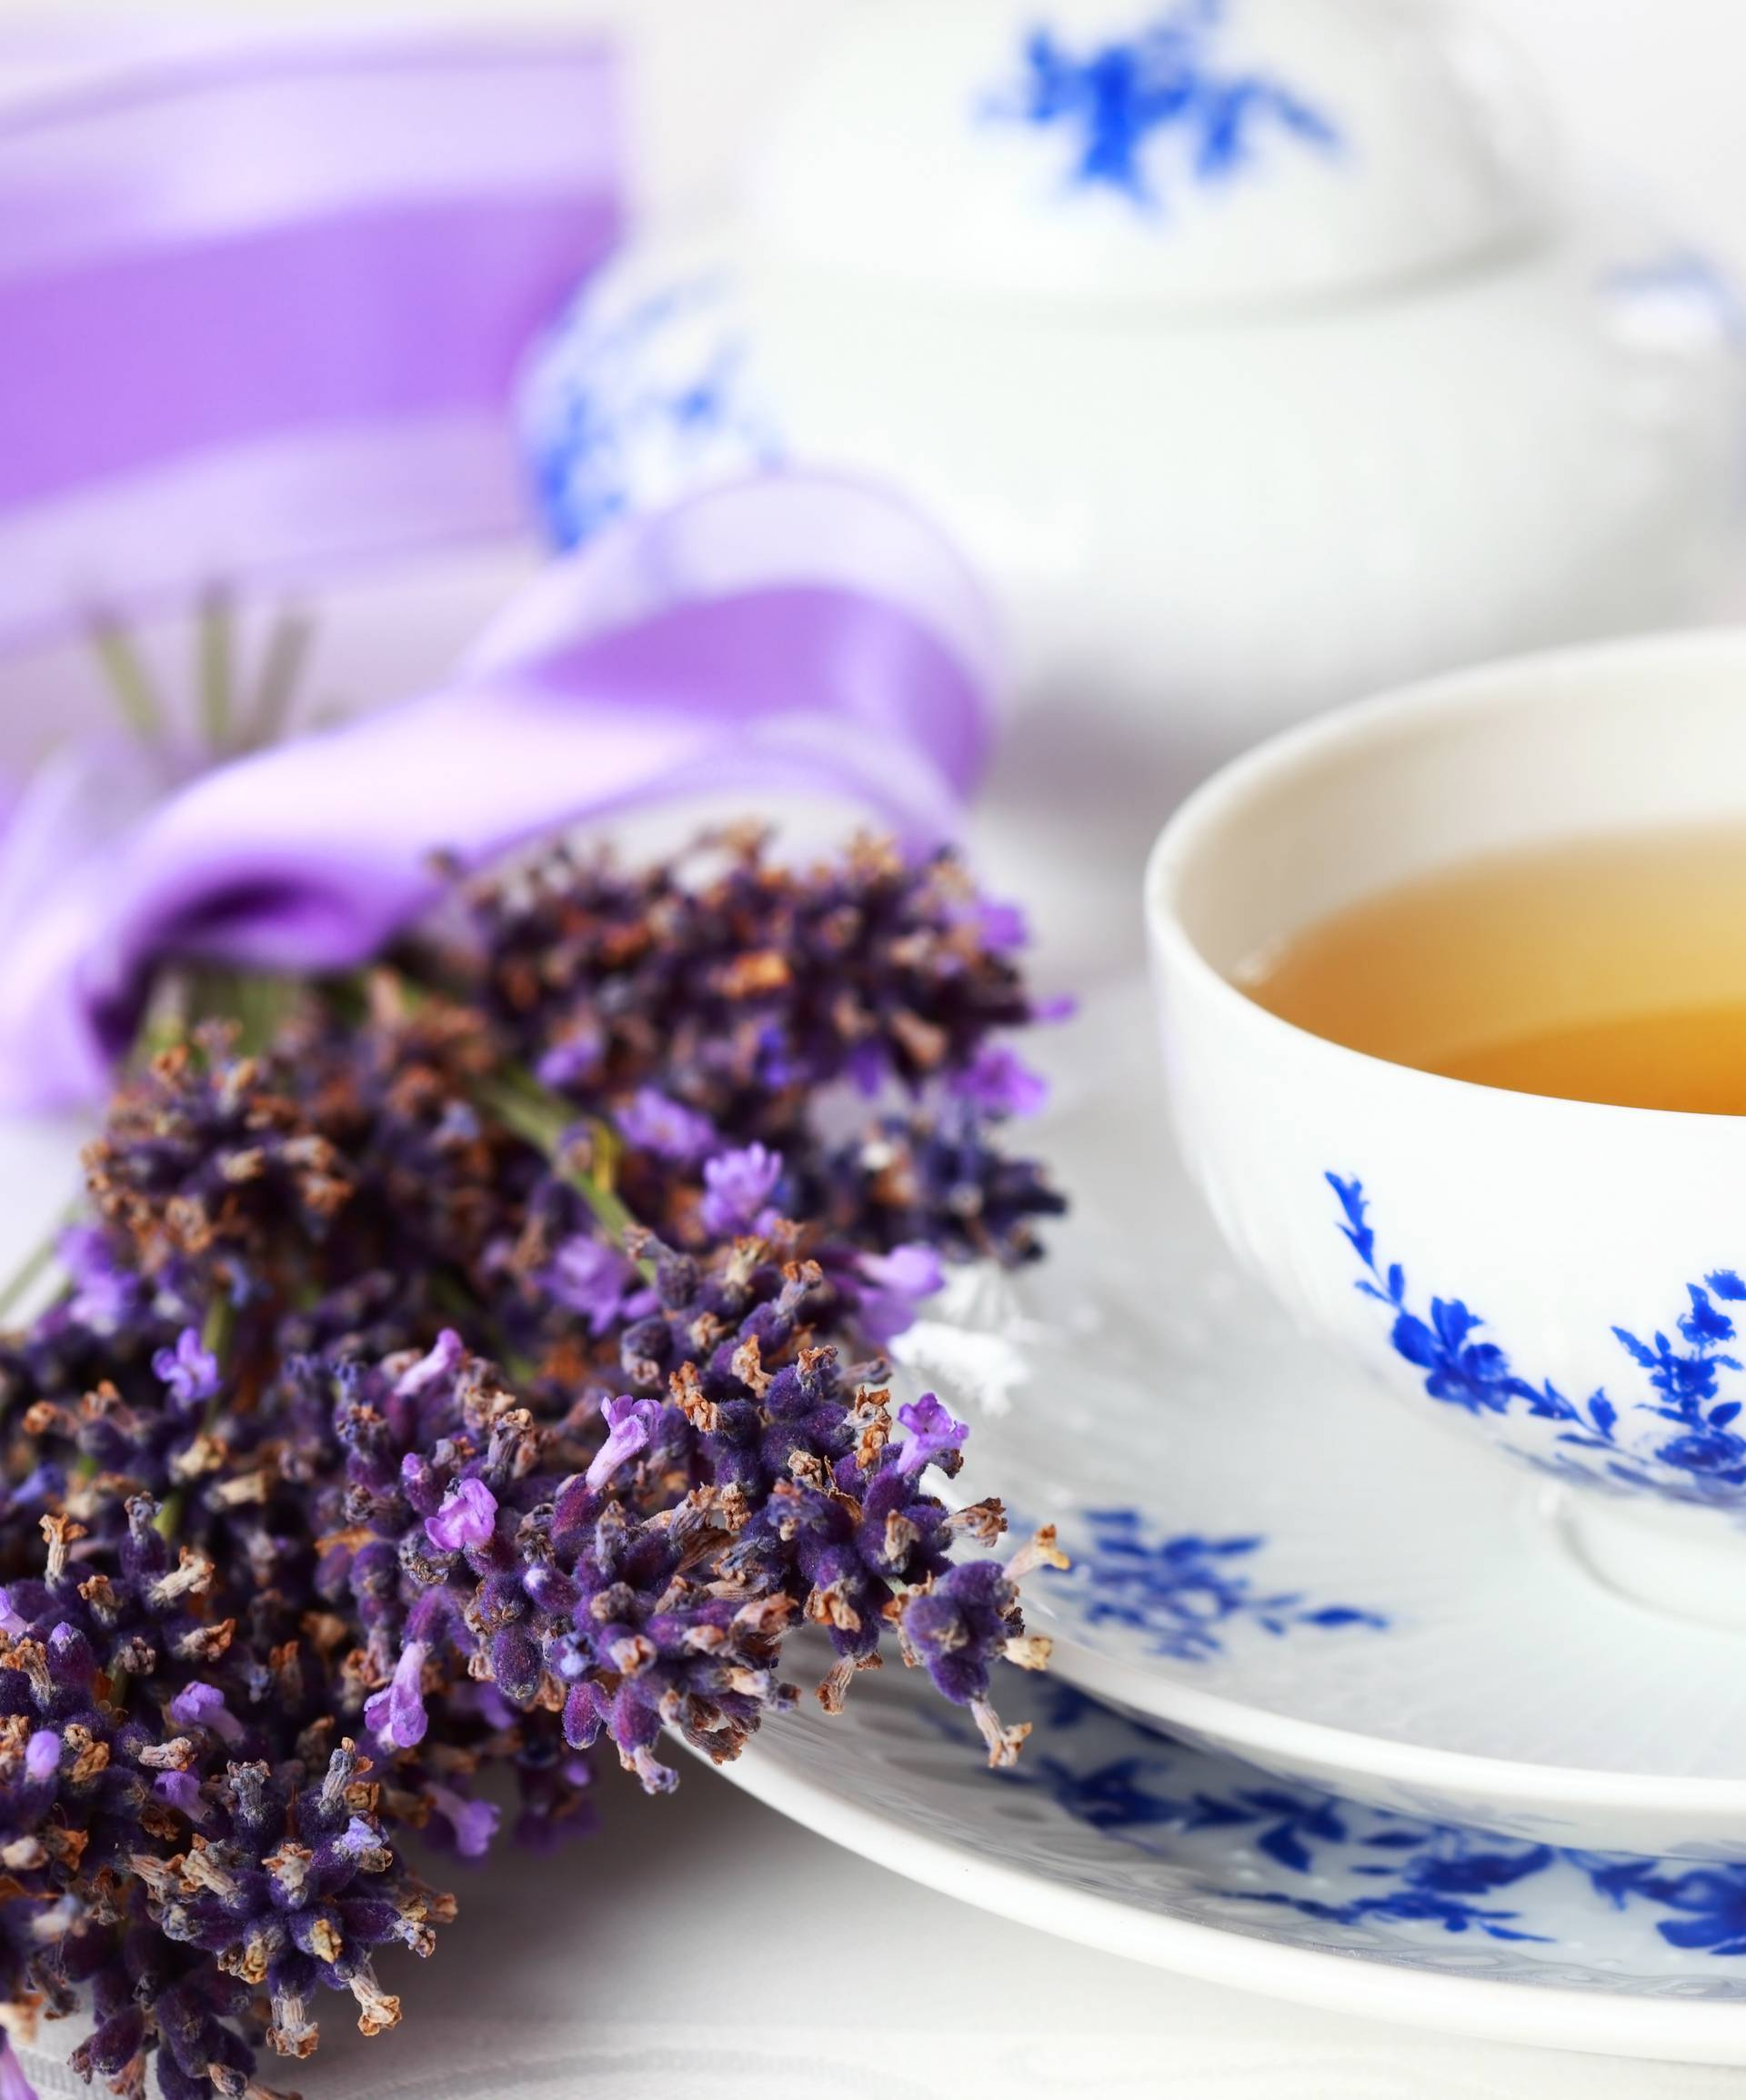 Popijte šalicu čaja od lavande za bolje raspoloženje i lakši san